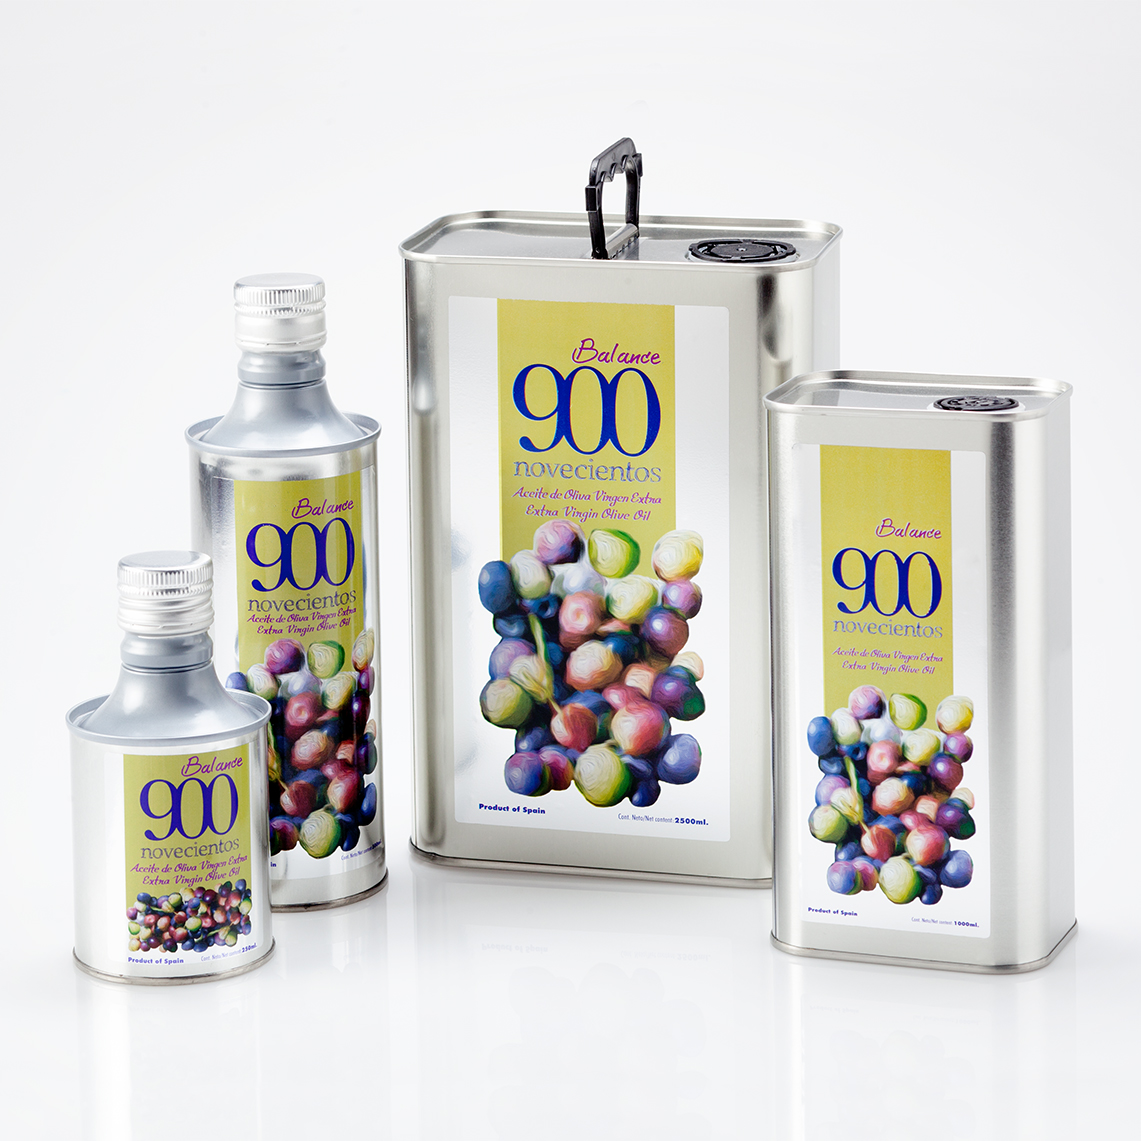 Gama Aceite de oliva virgen extra 900 BALANCE